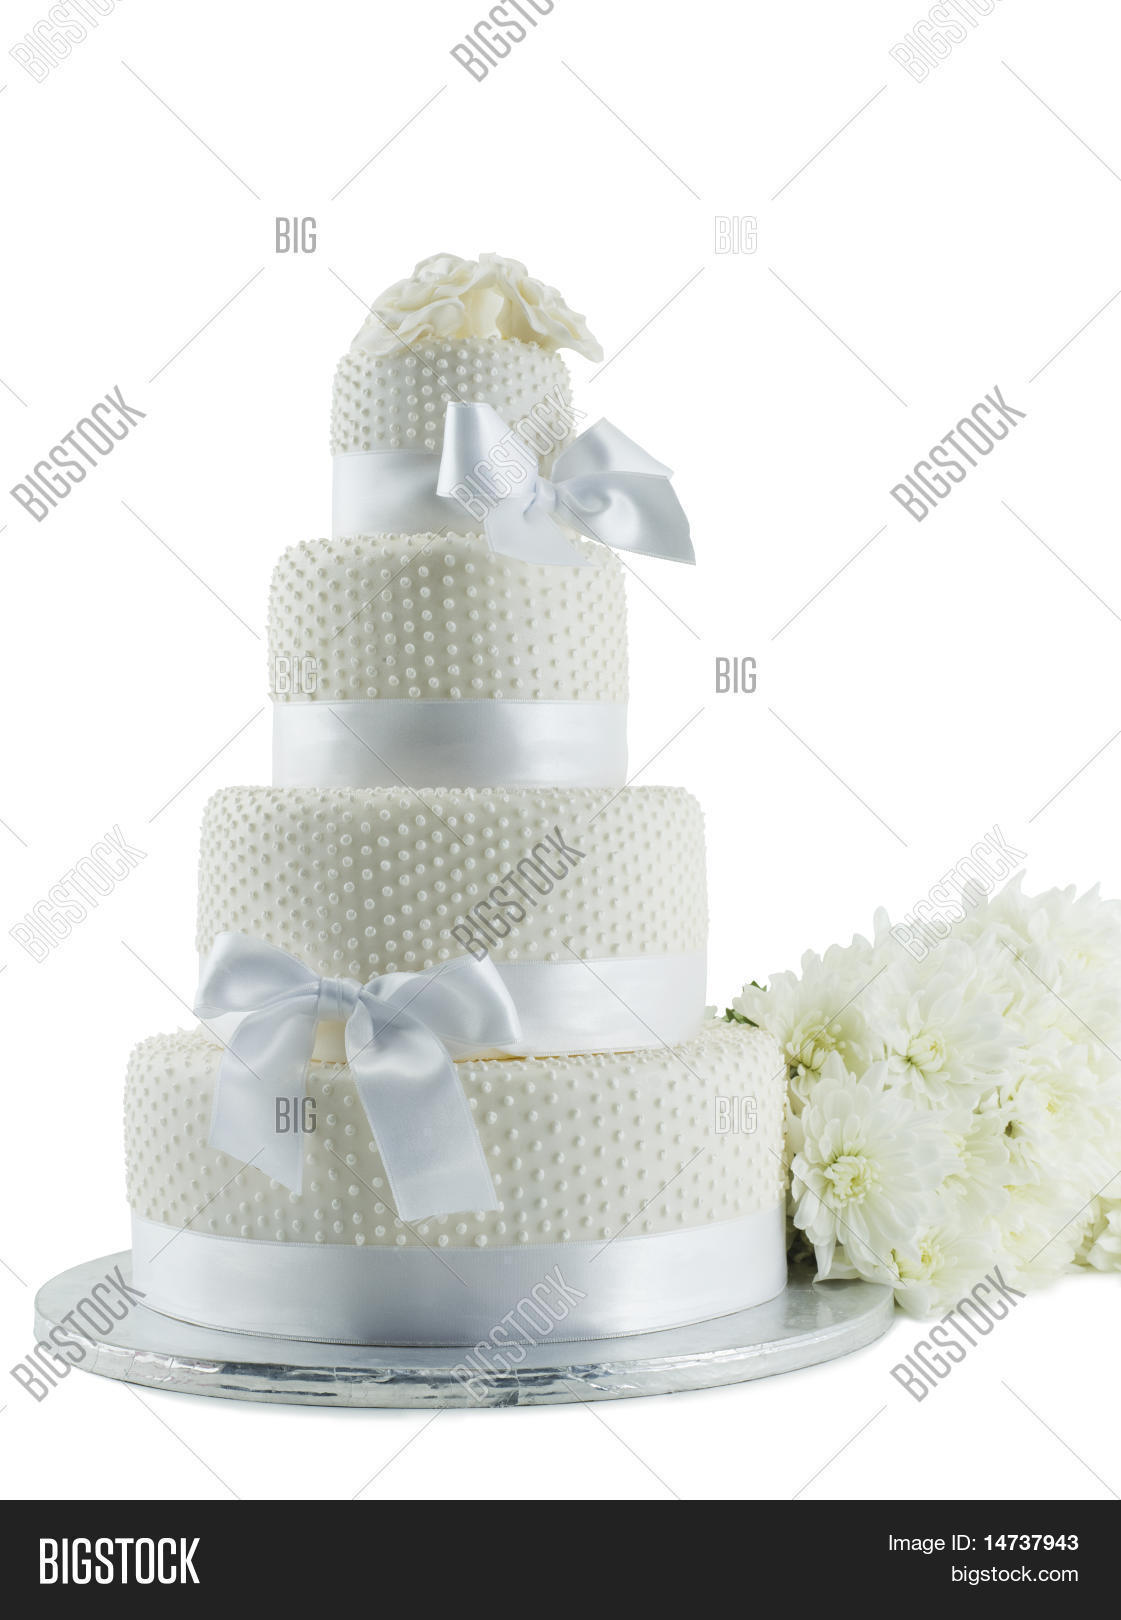 Wedding Cake Flowers Image Photo Free Trial Bigstock